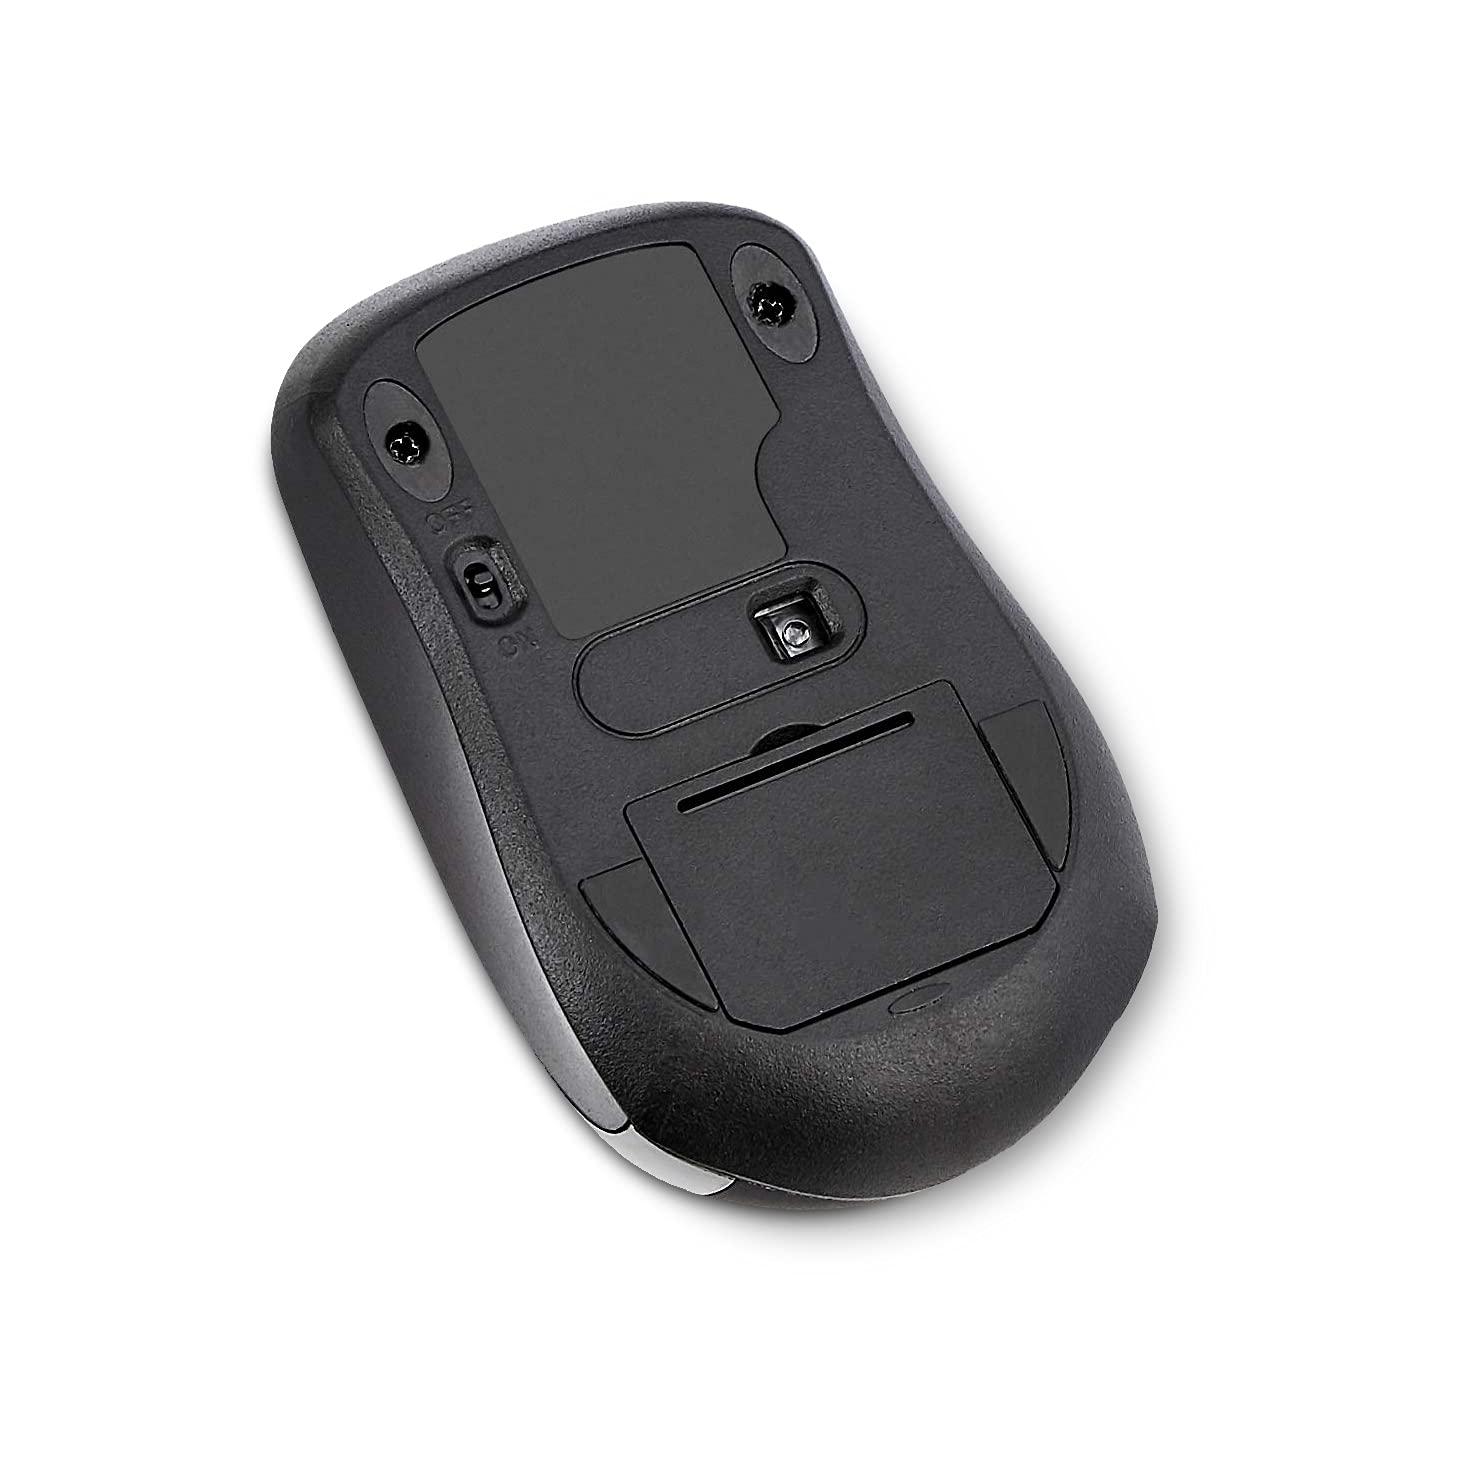 Amazon Basics Wireless Computer Mouse with USB Nano Receiver - Black